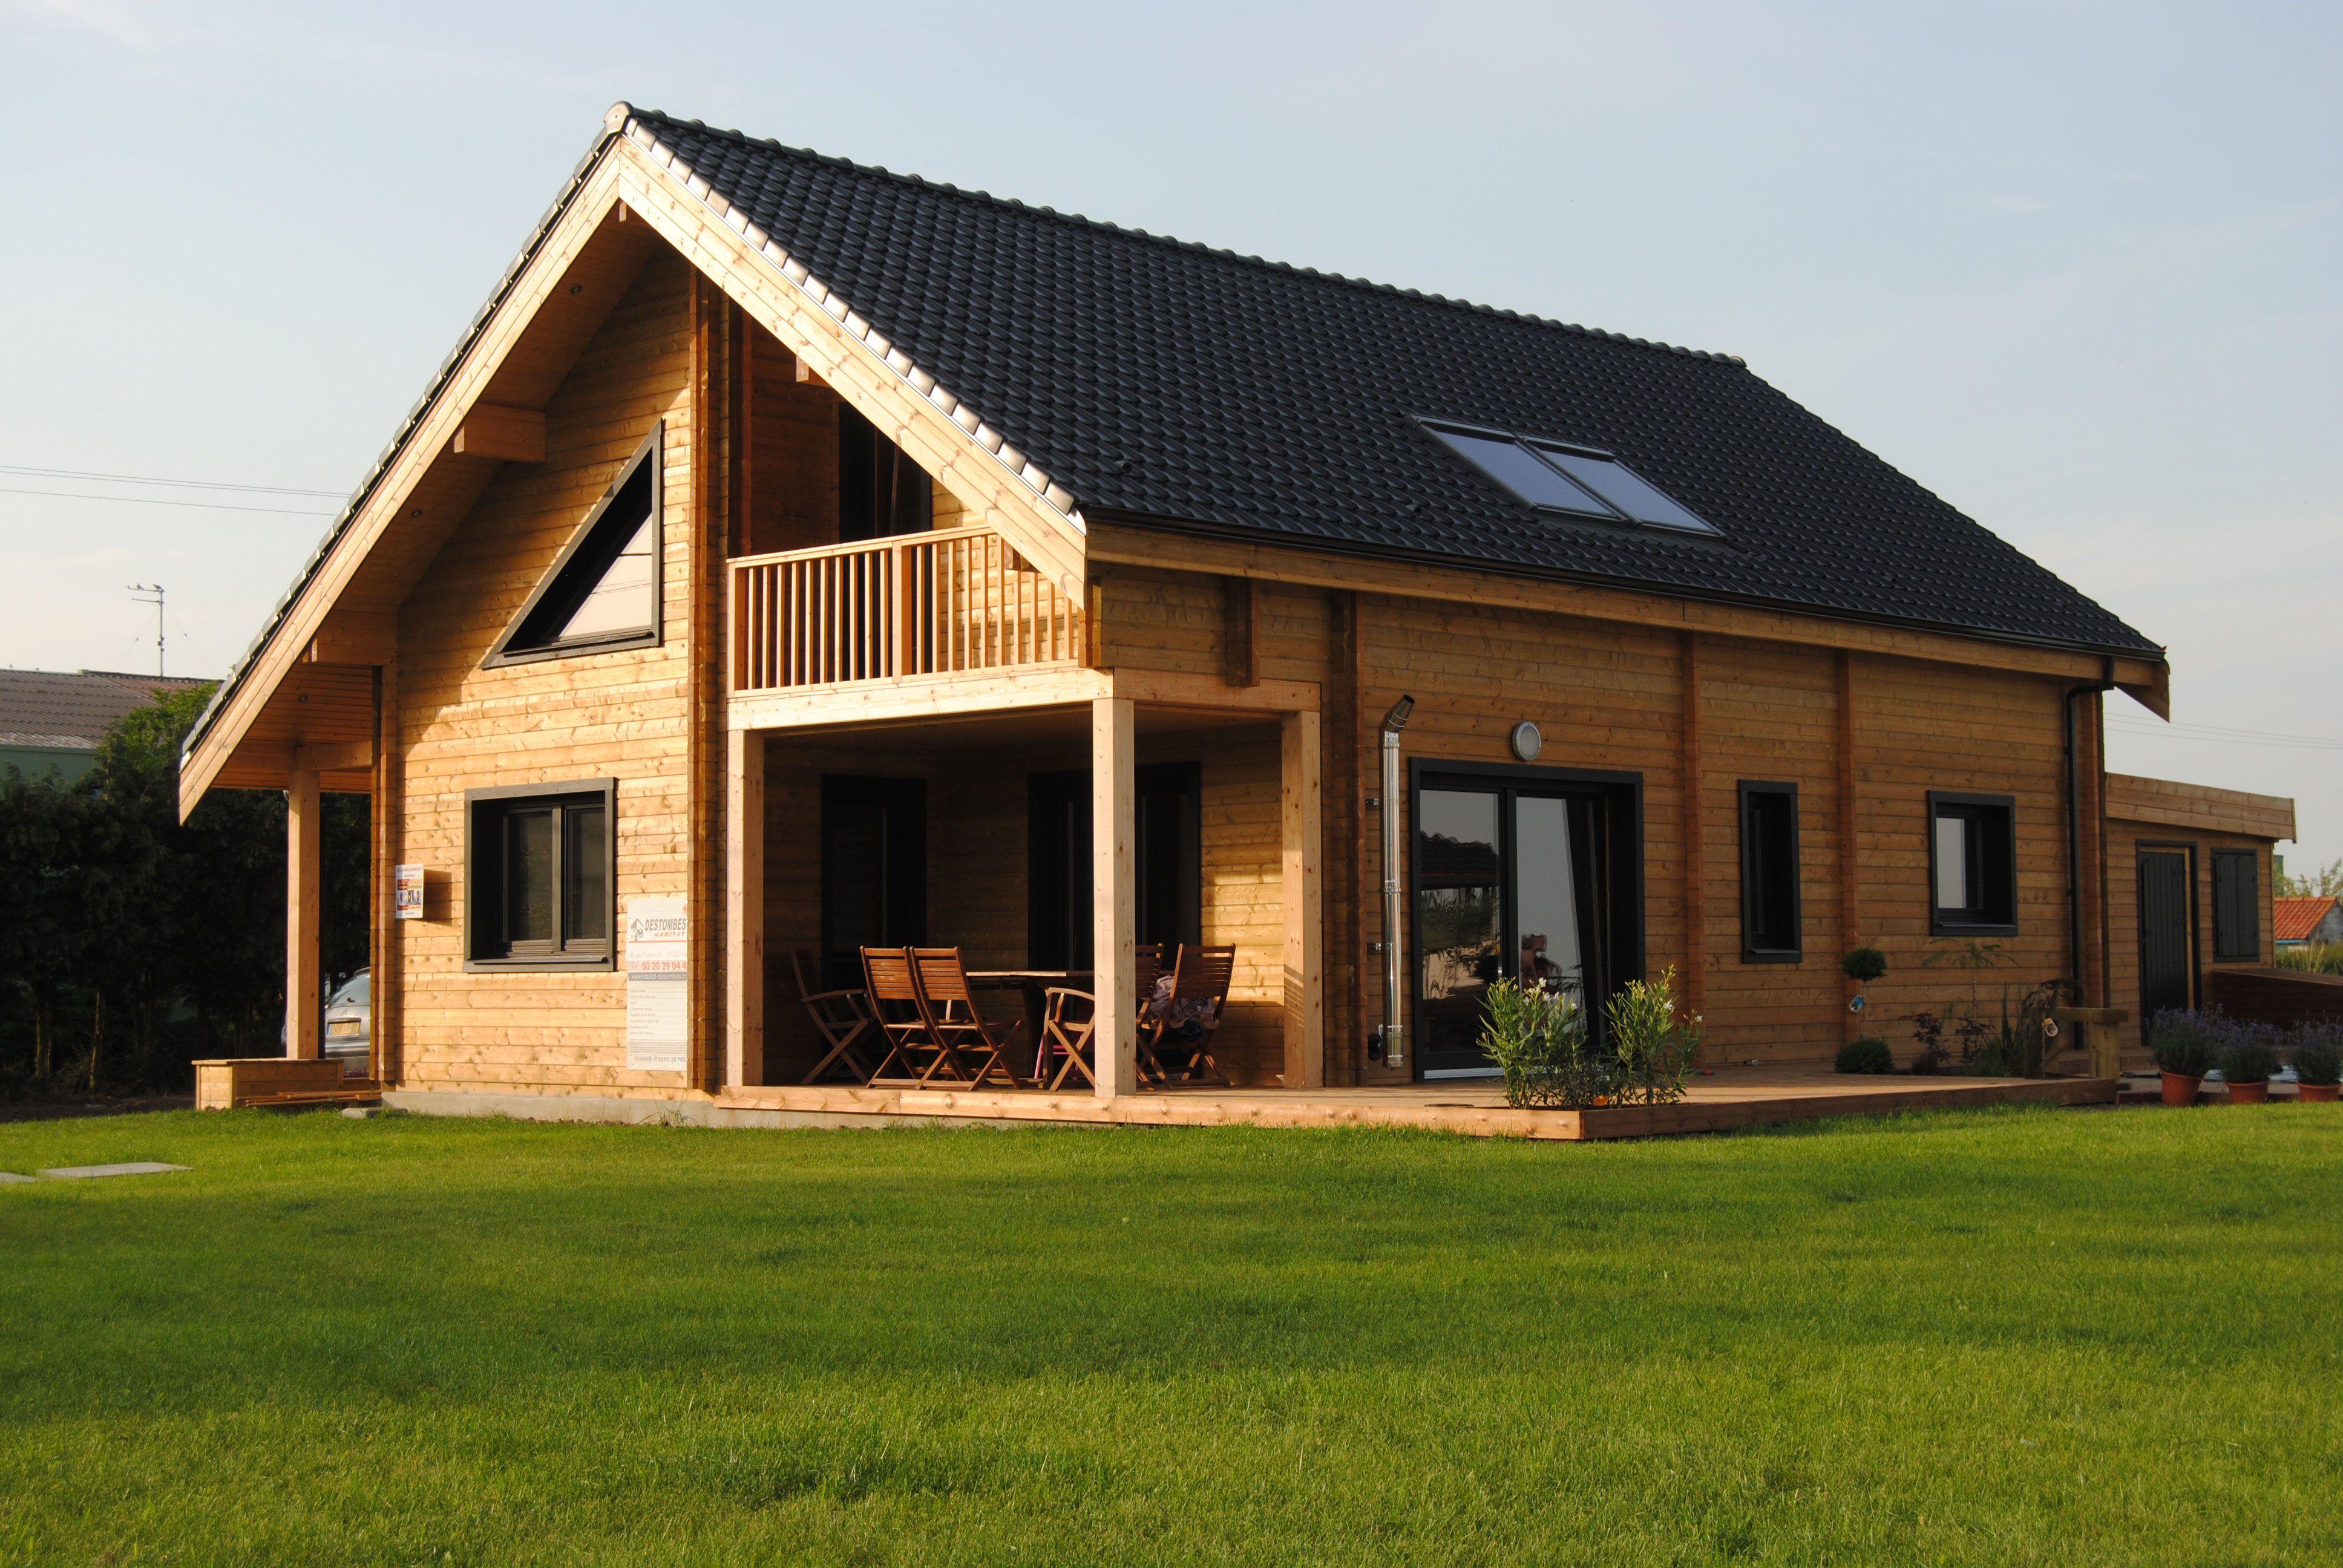 Pin by Leslie sanders on Pole barn house